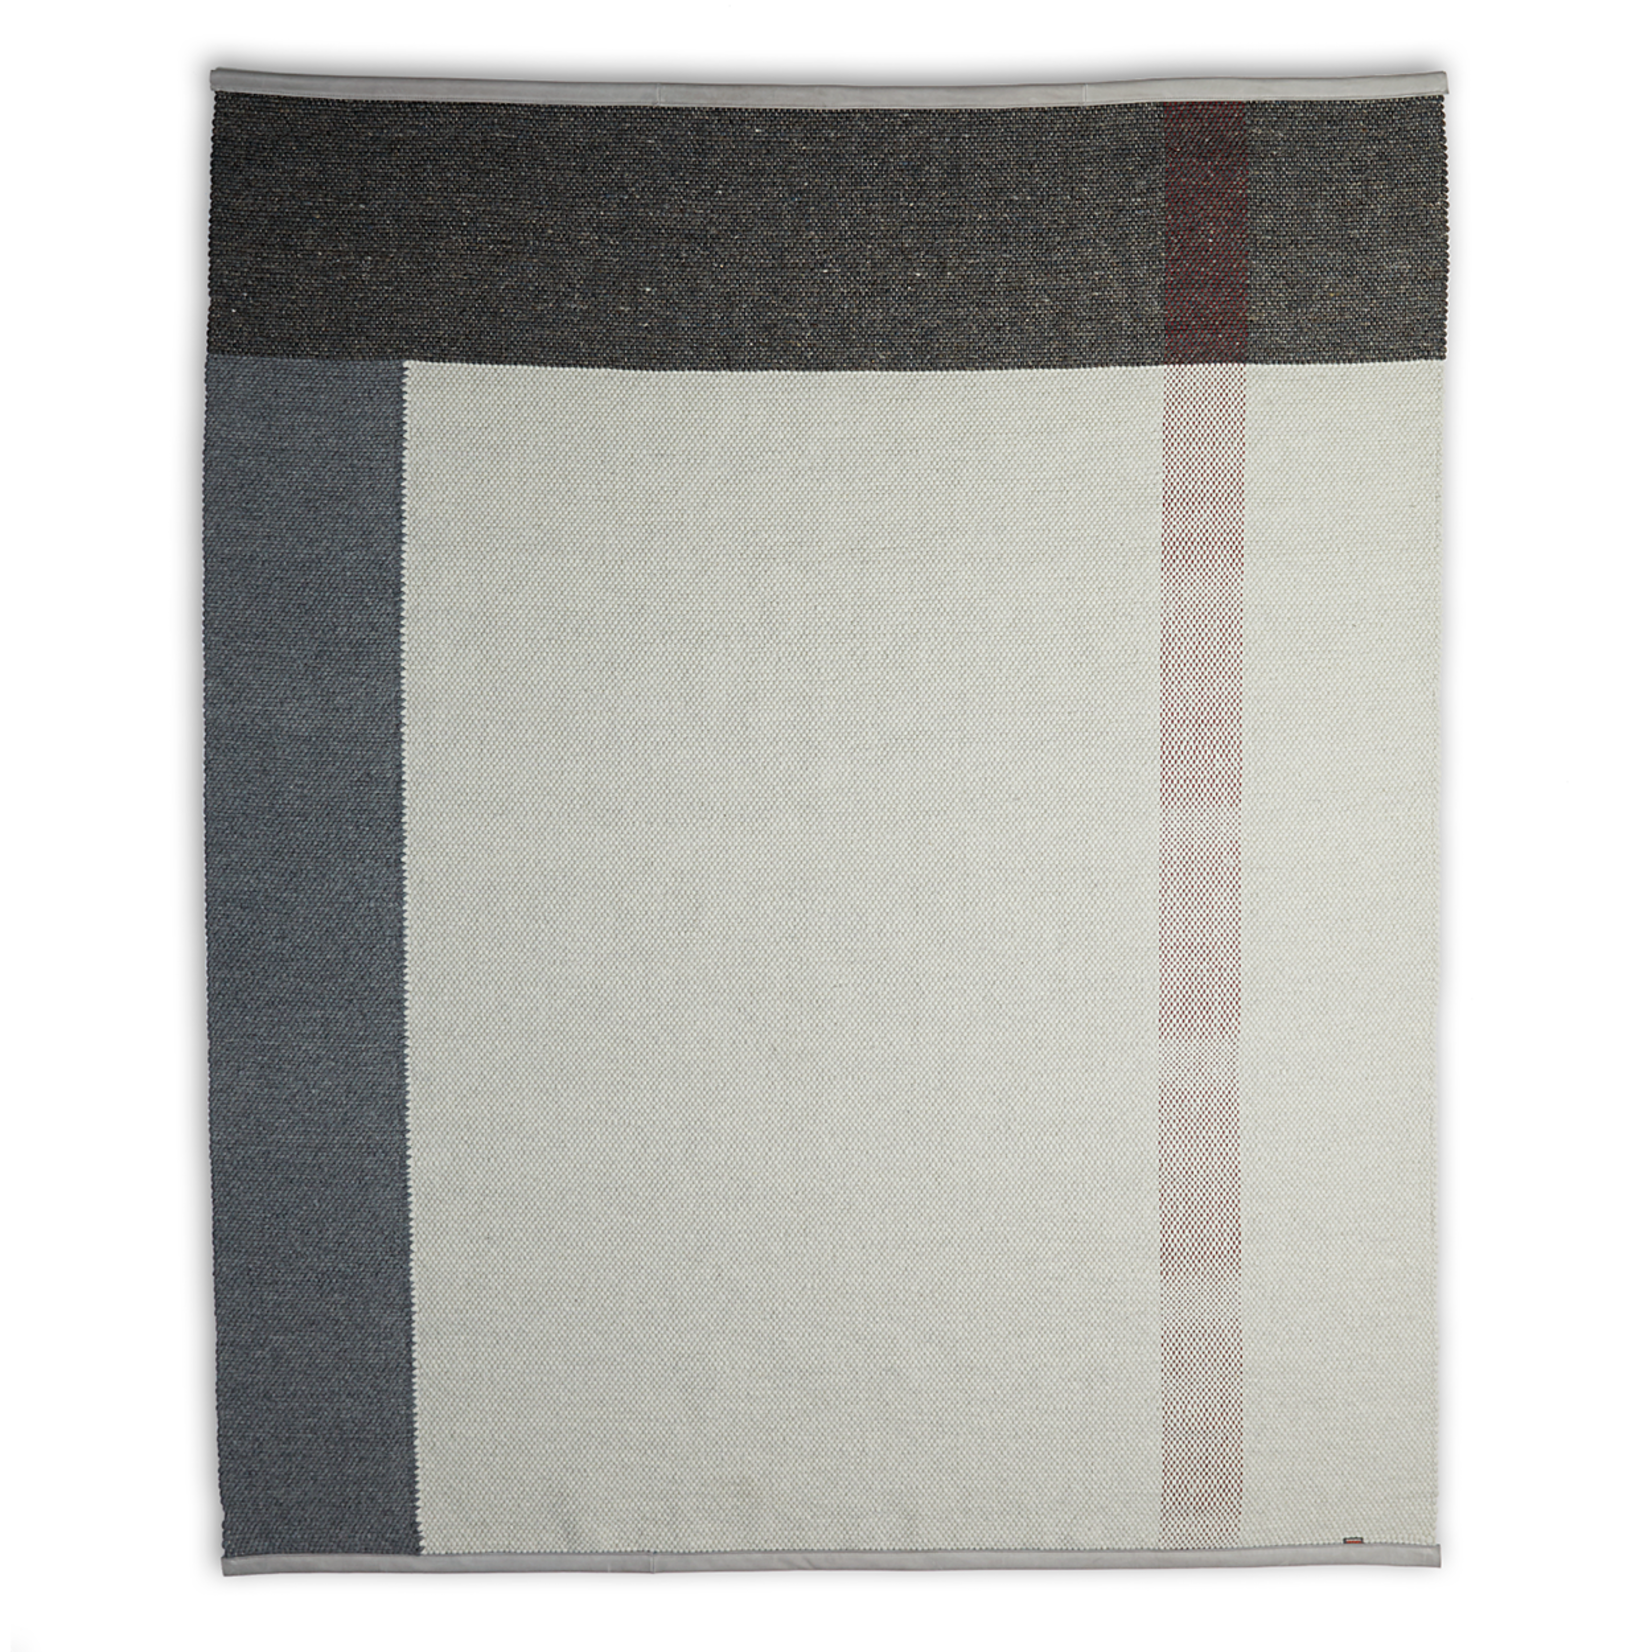 LABEL | Vandenberg Red Chain Carpet Grey